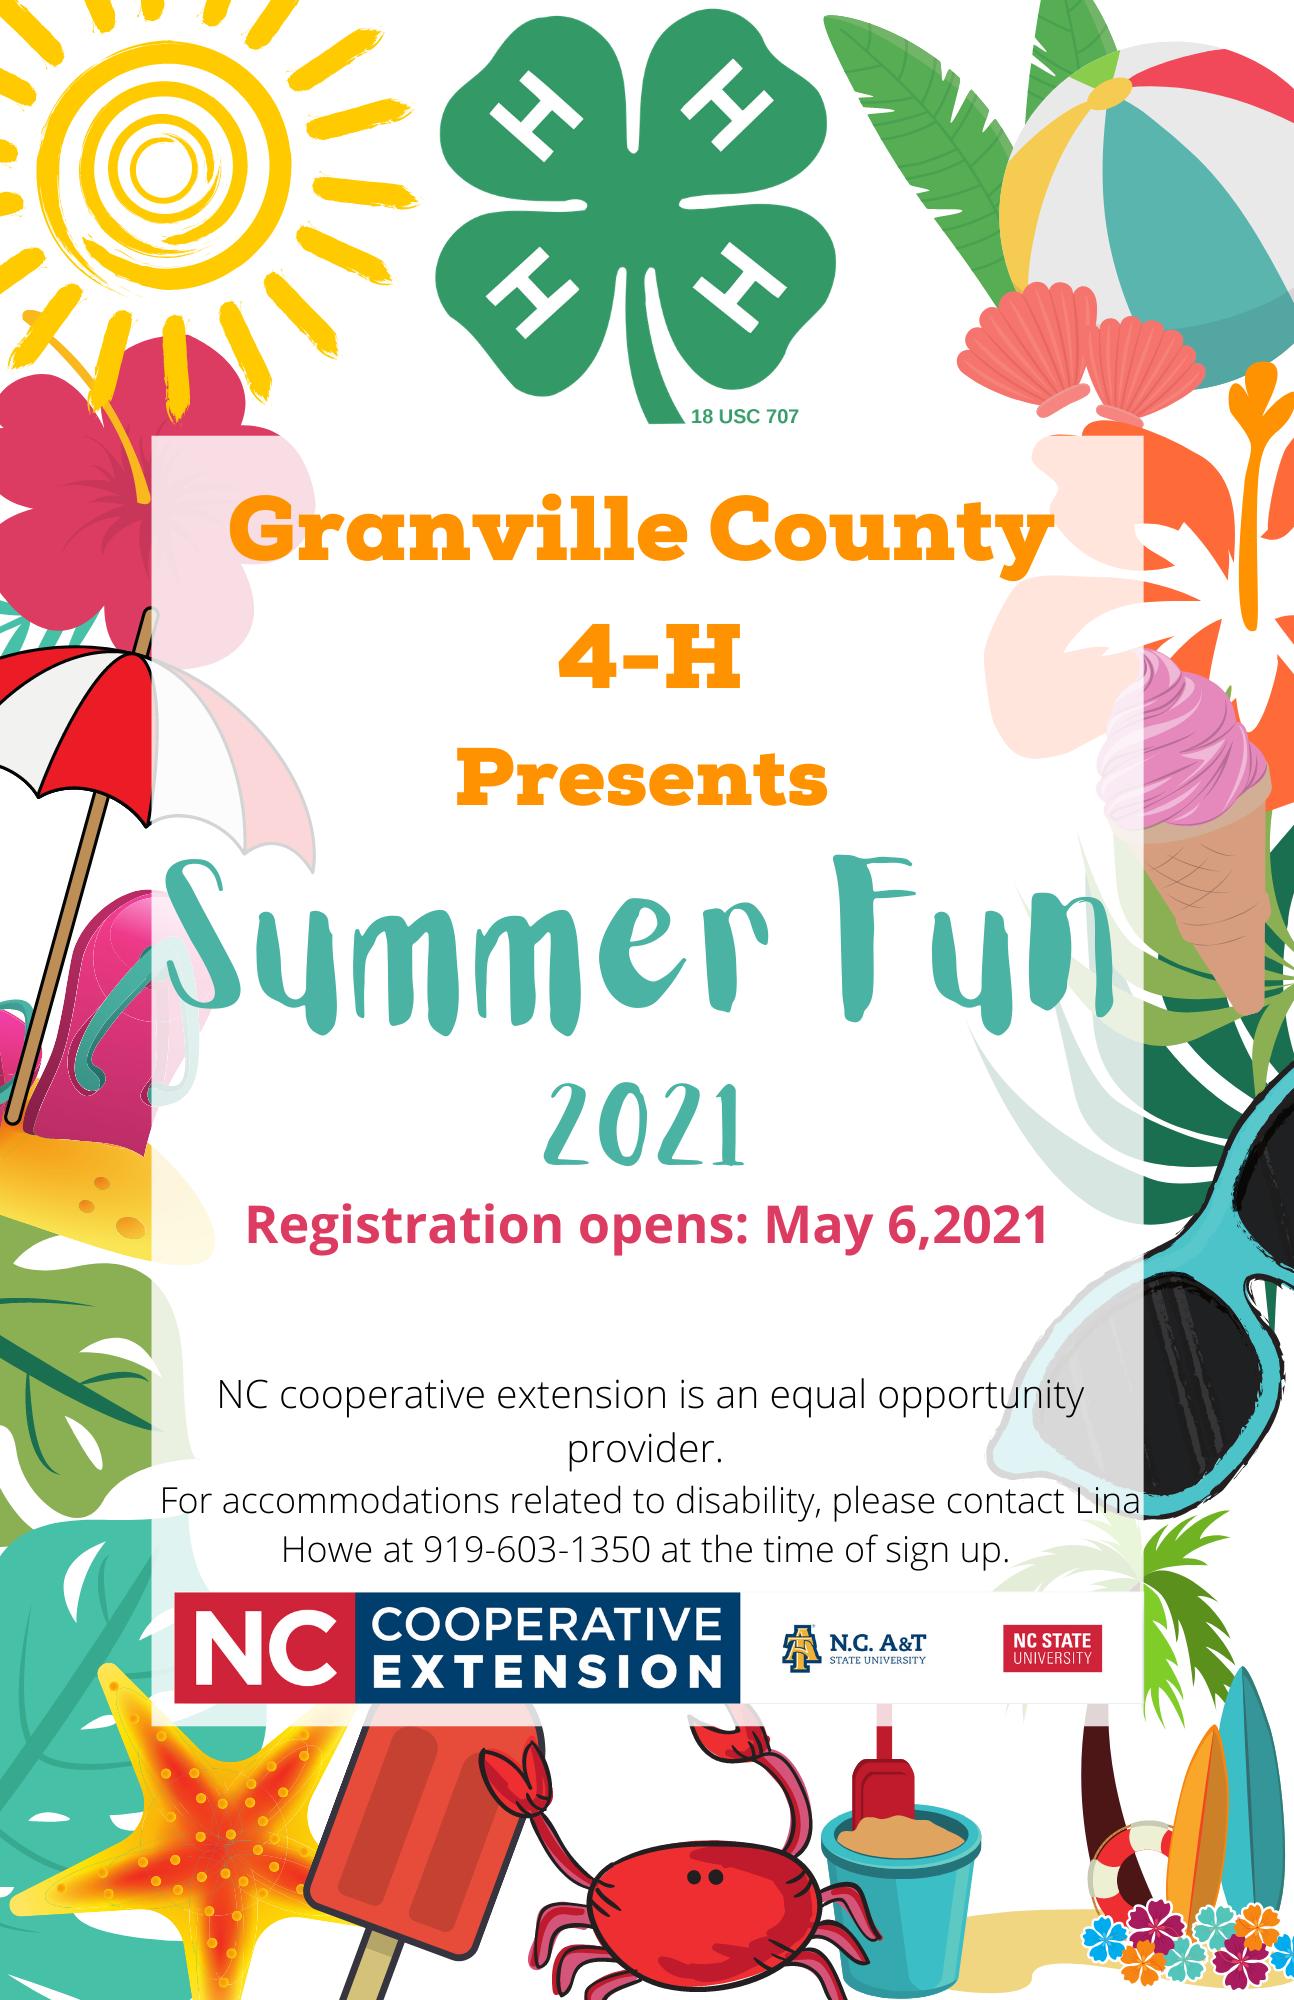 Summer Fun flyer image